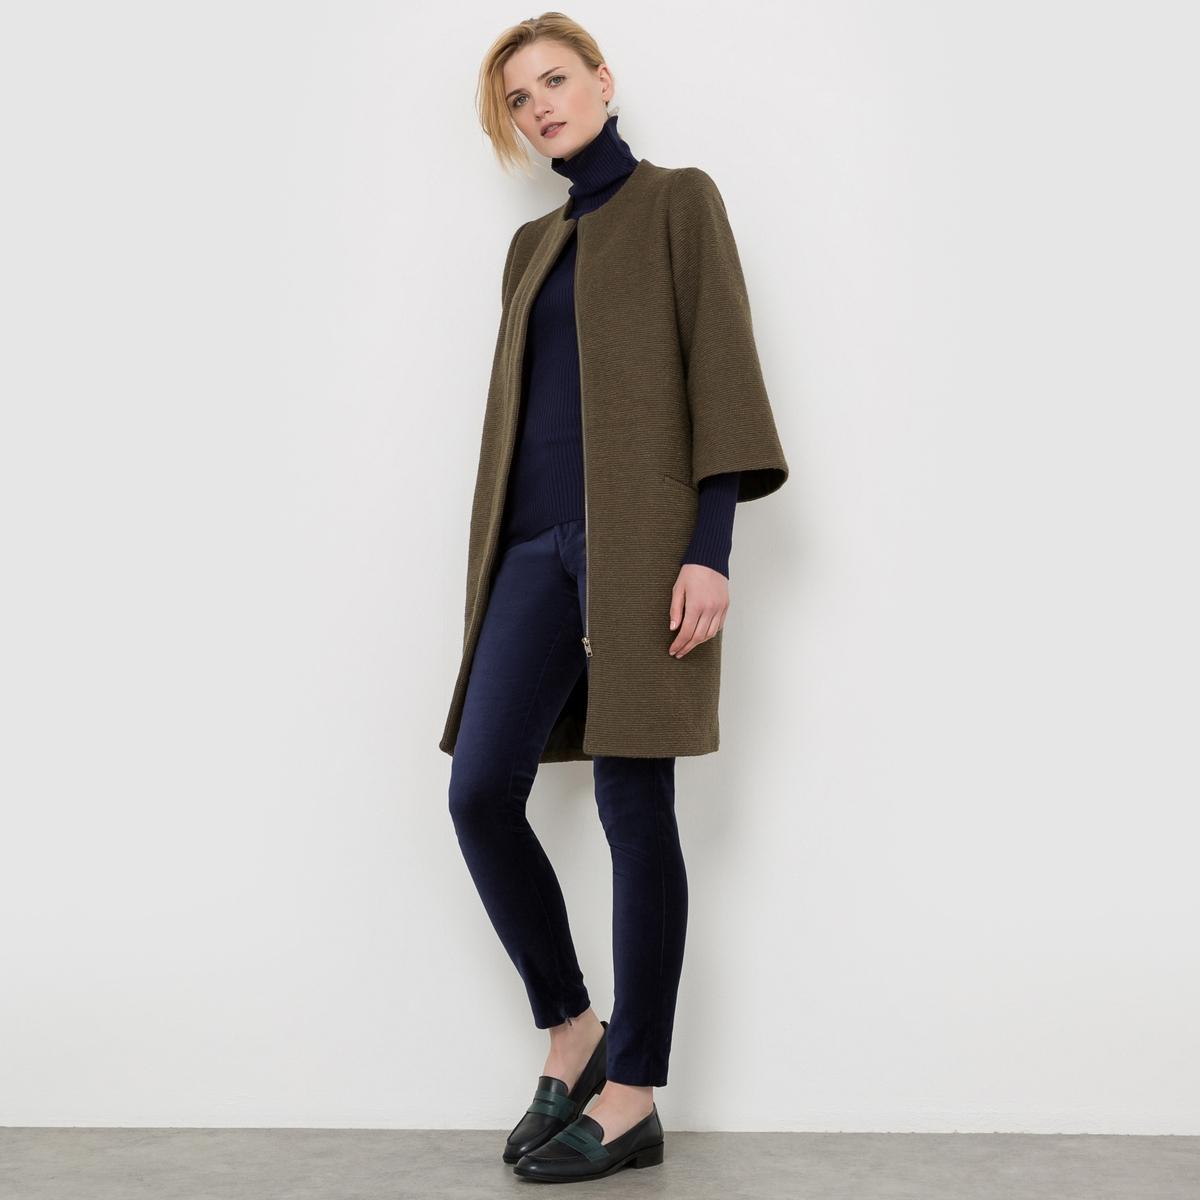 Пальто на молнии, 50% шерсти пальто на молнии из шерстяного драпа